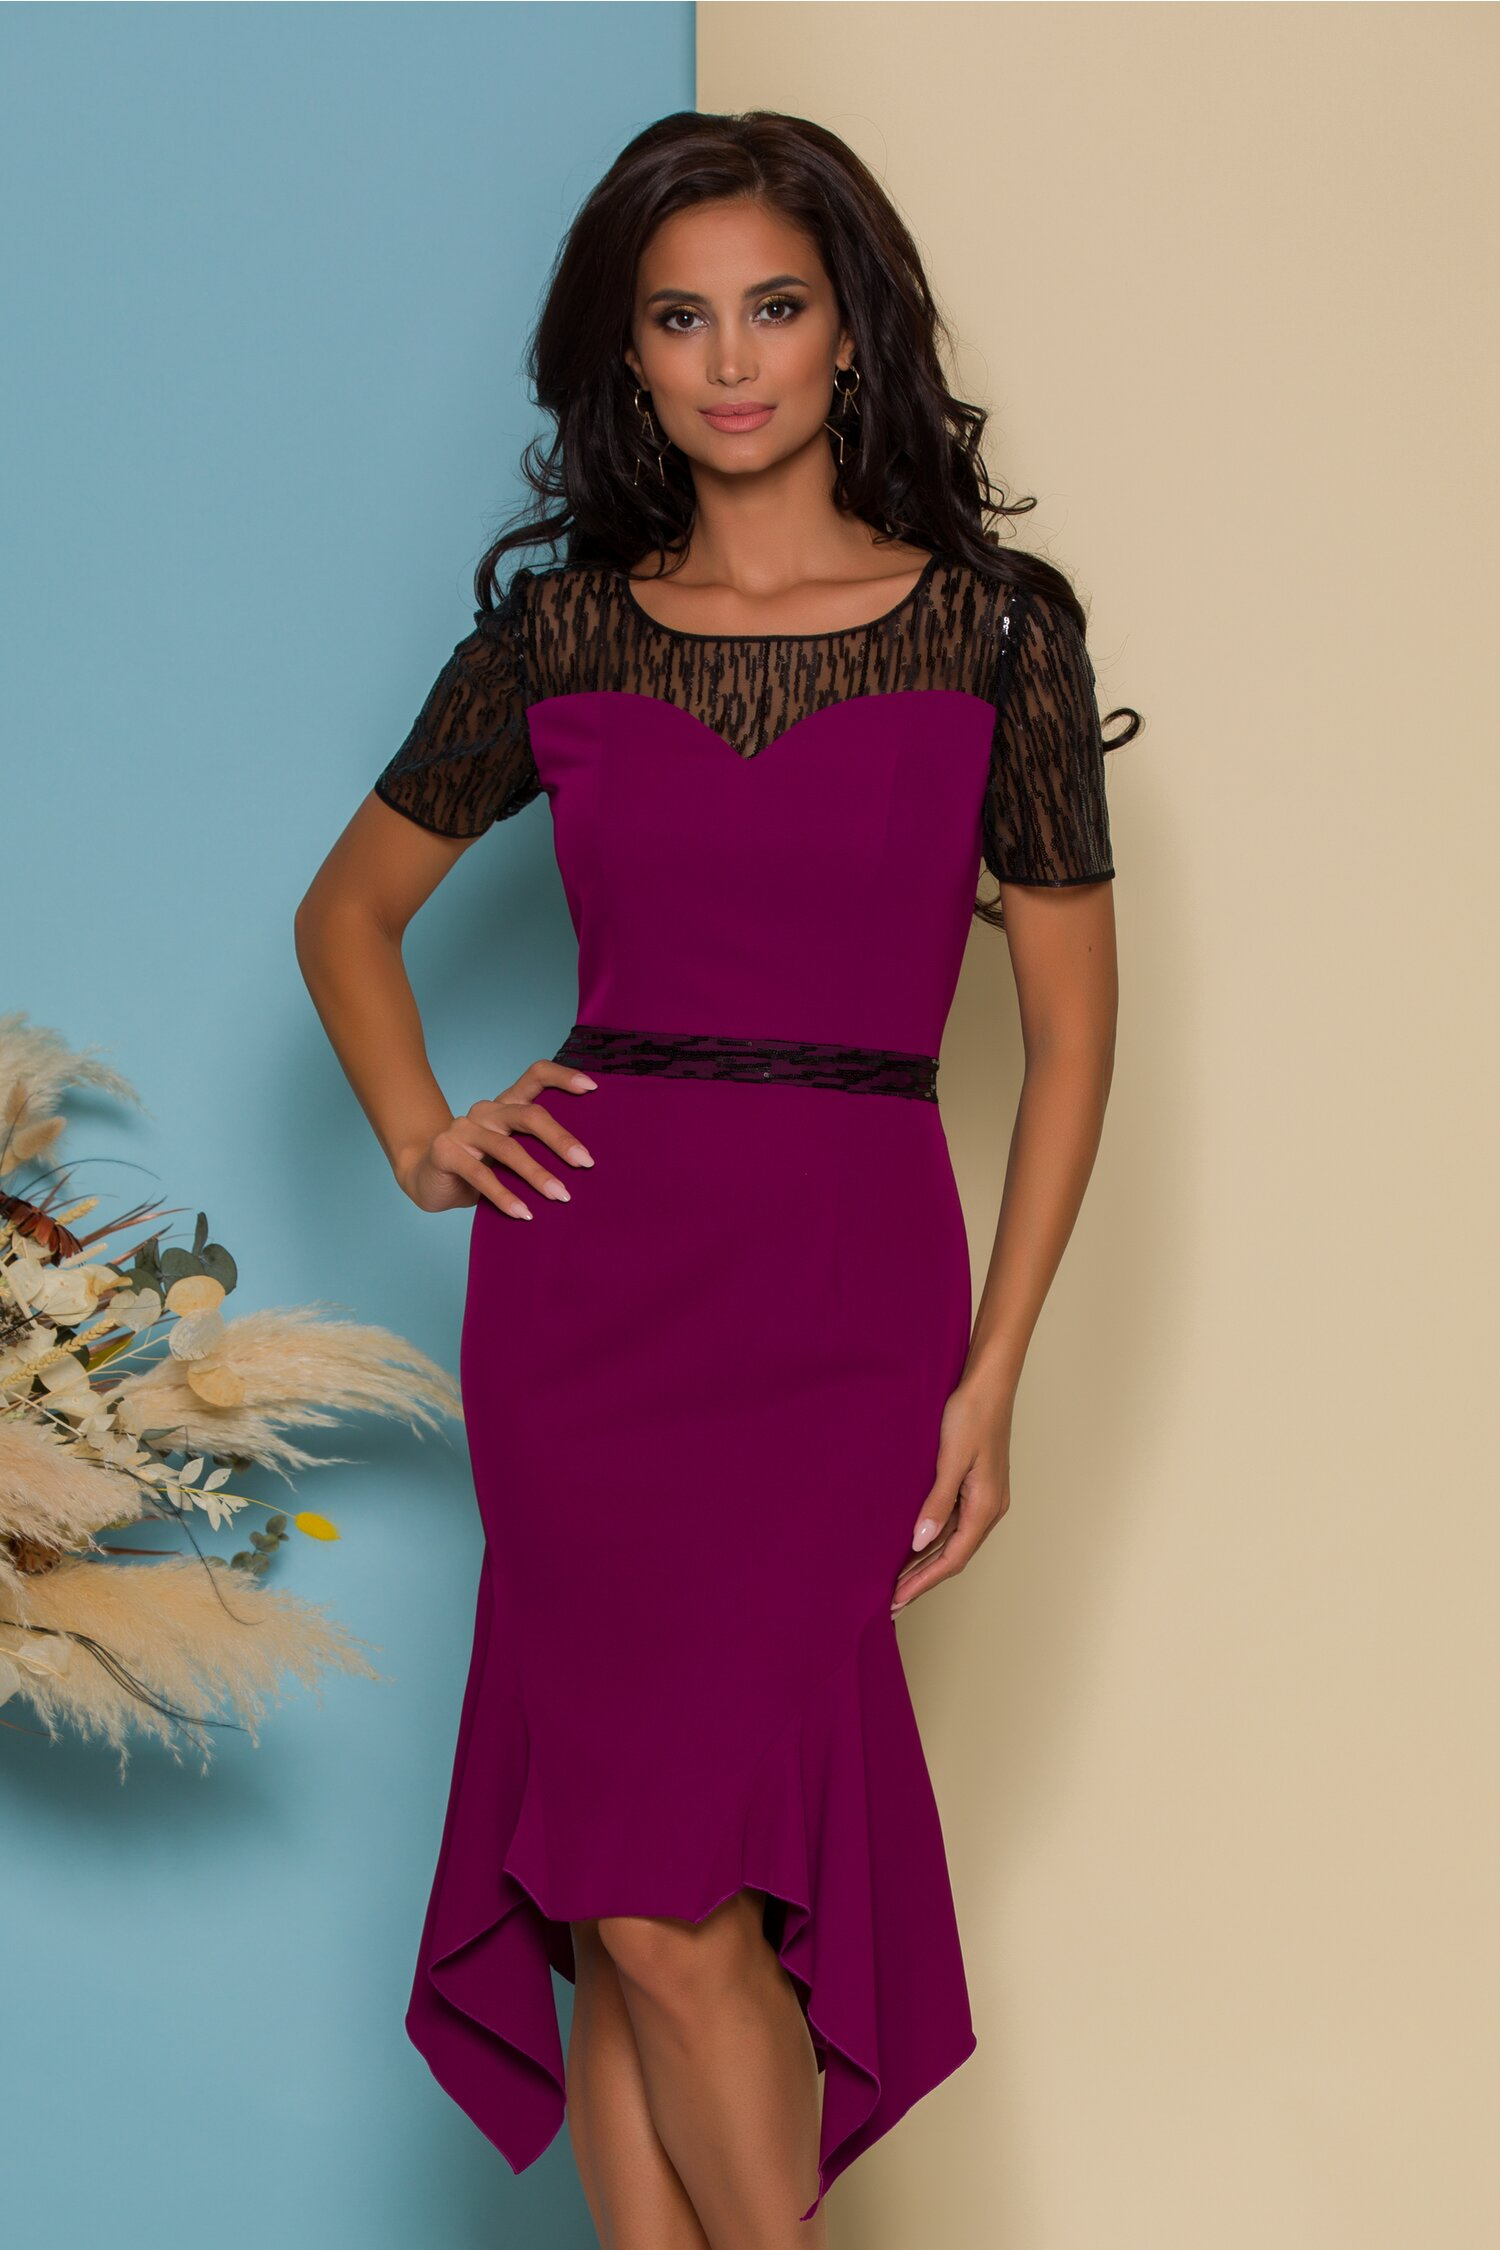 rochie violeta mov cu paiete si croi asimetric 557841 4